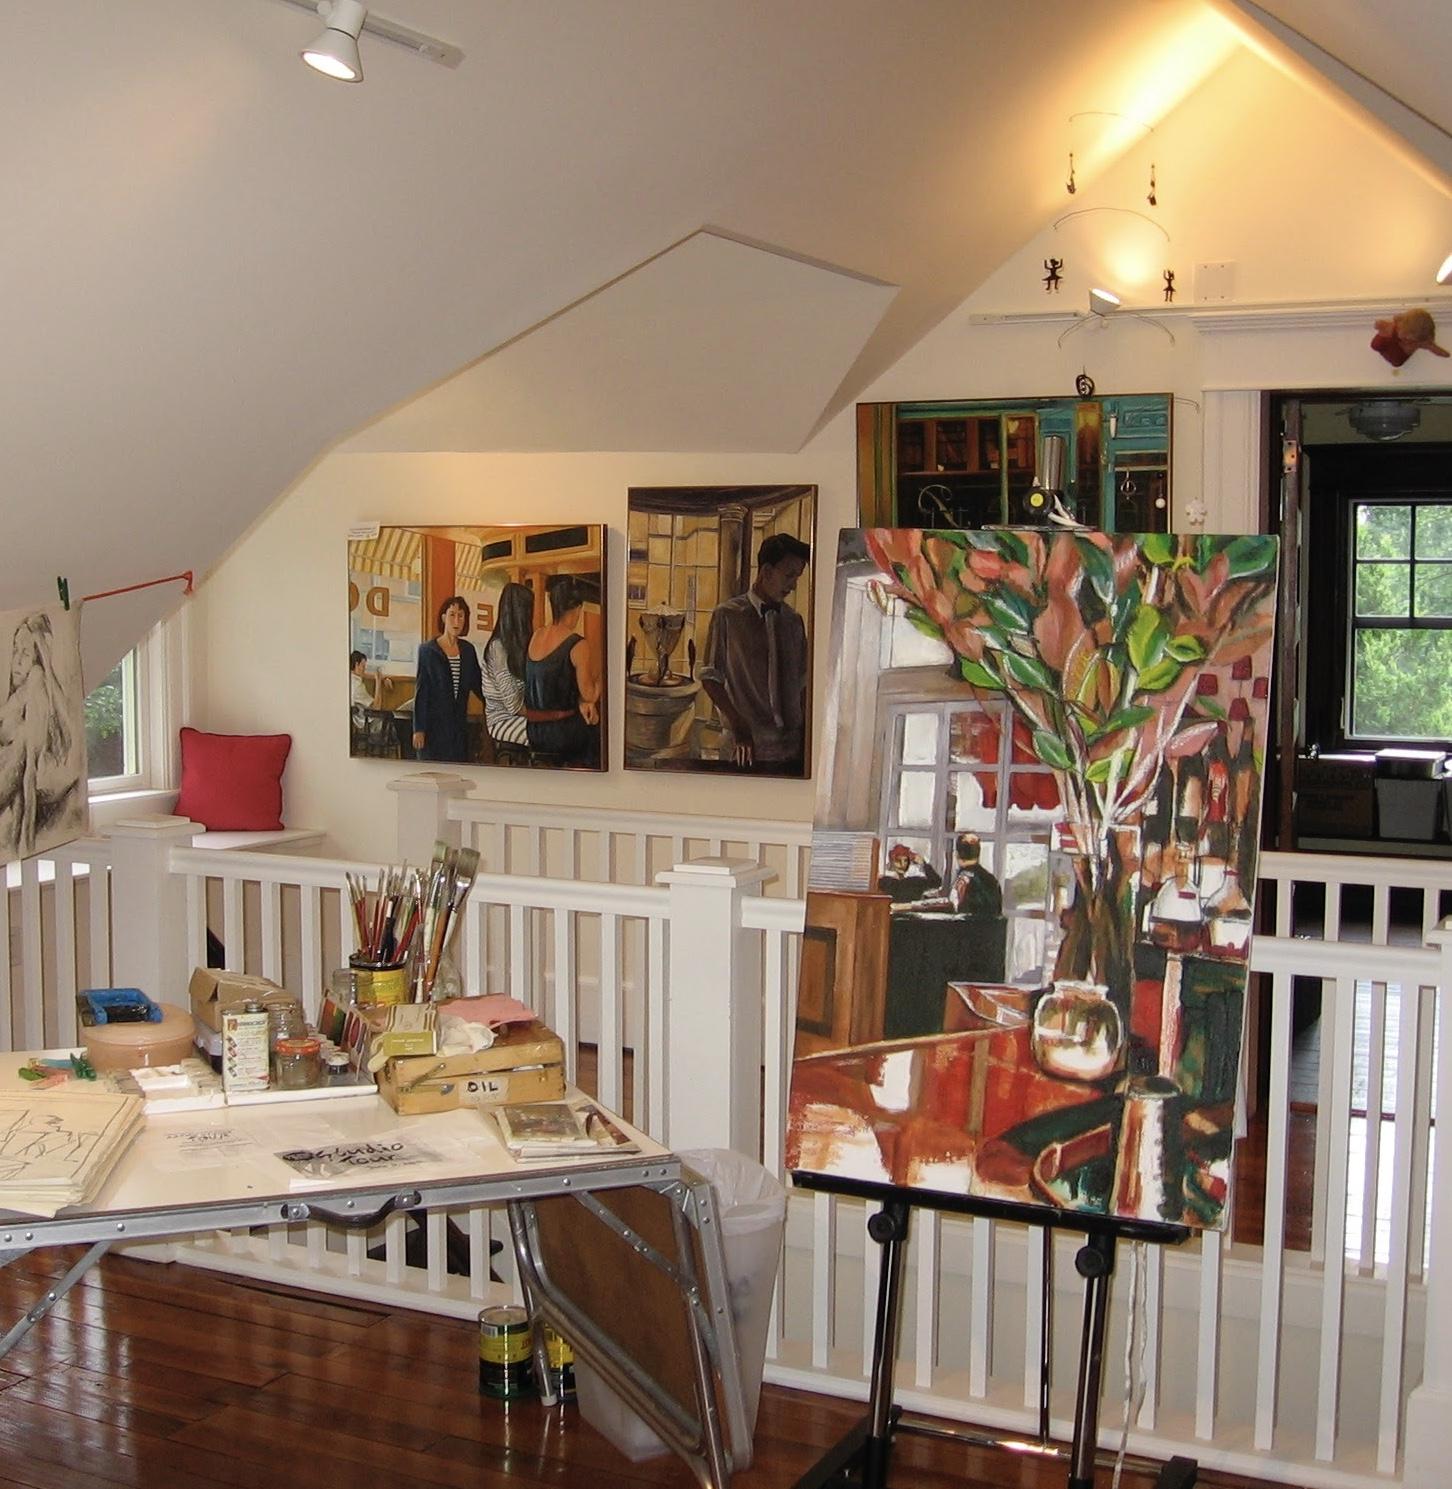 studio tour of south orange & Maplewood   (Home Studio) -